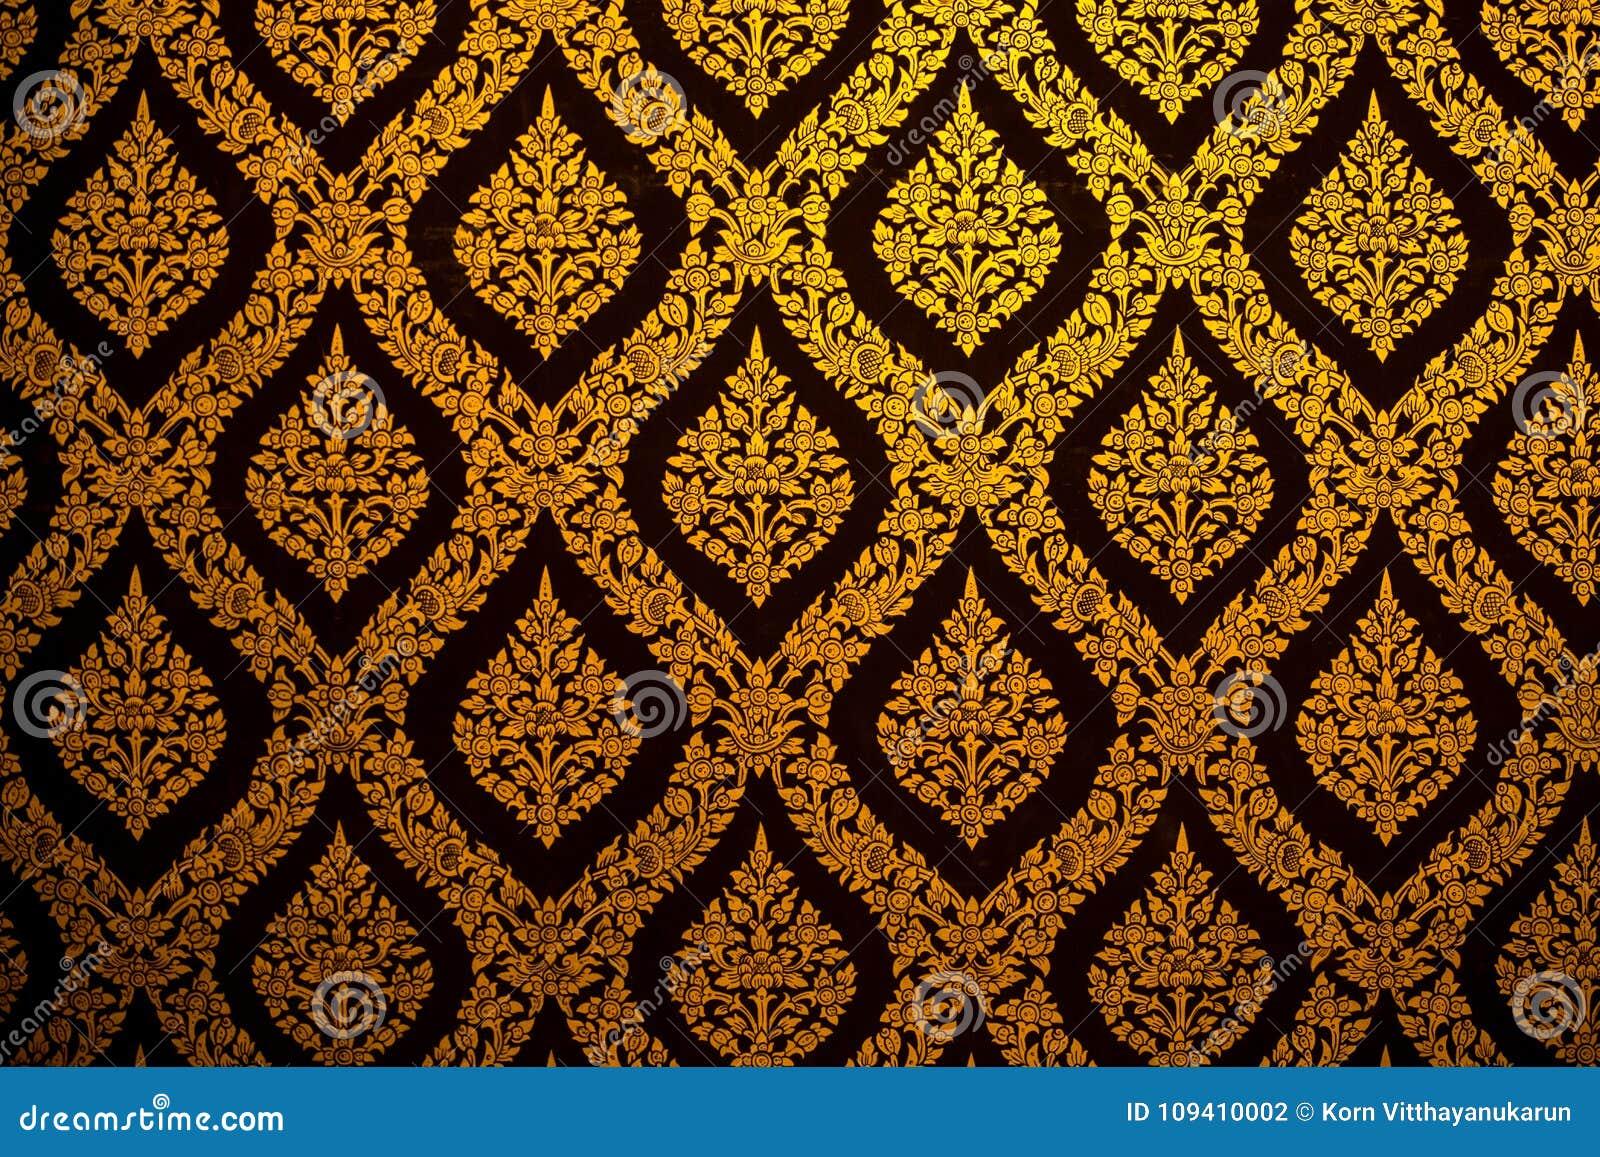 Thai pattern wallpaper culture art background